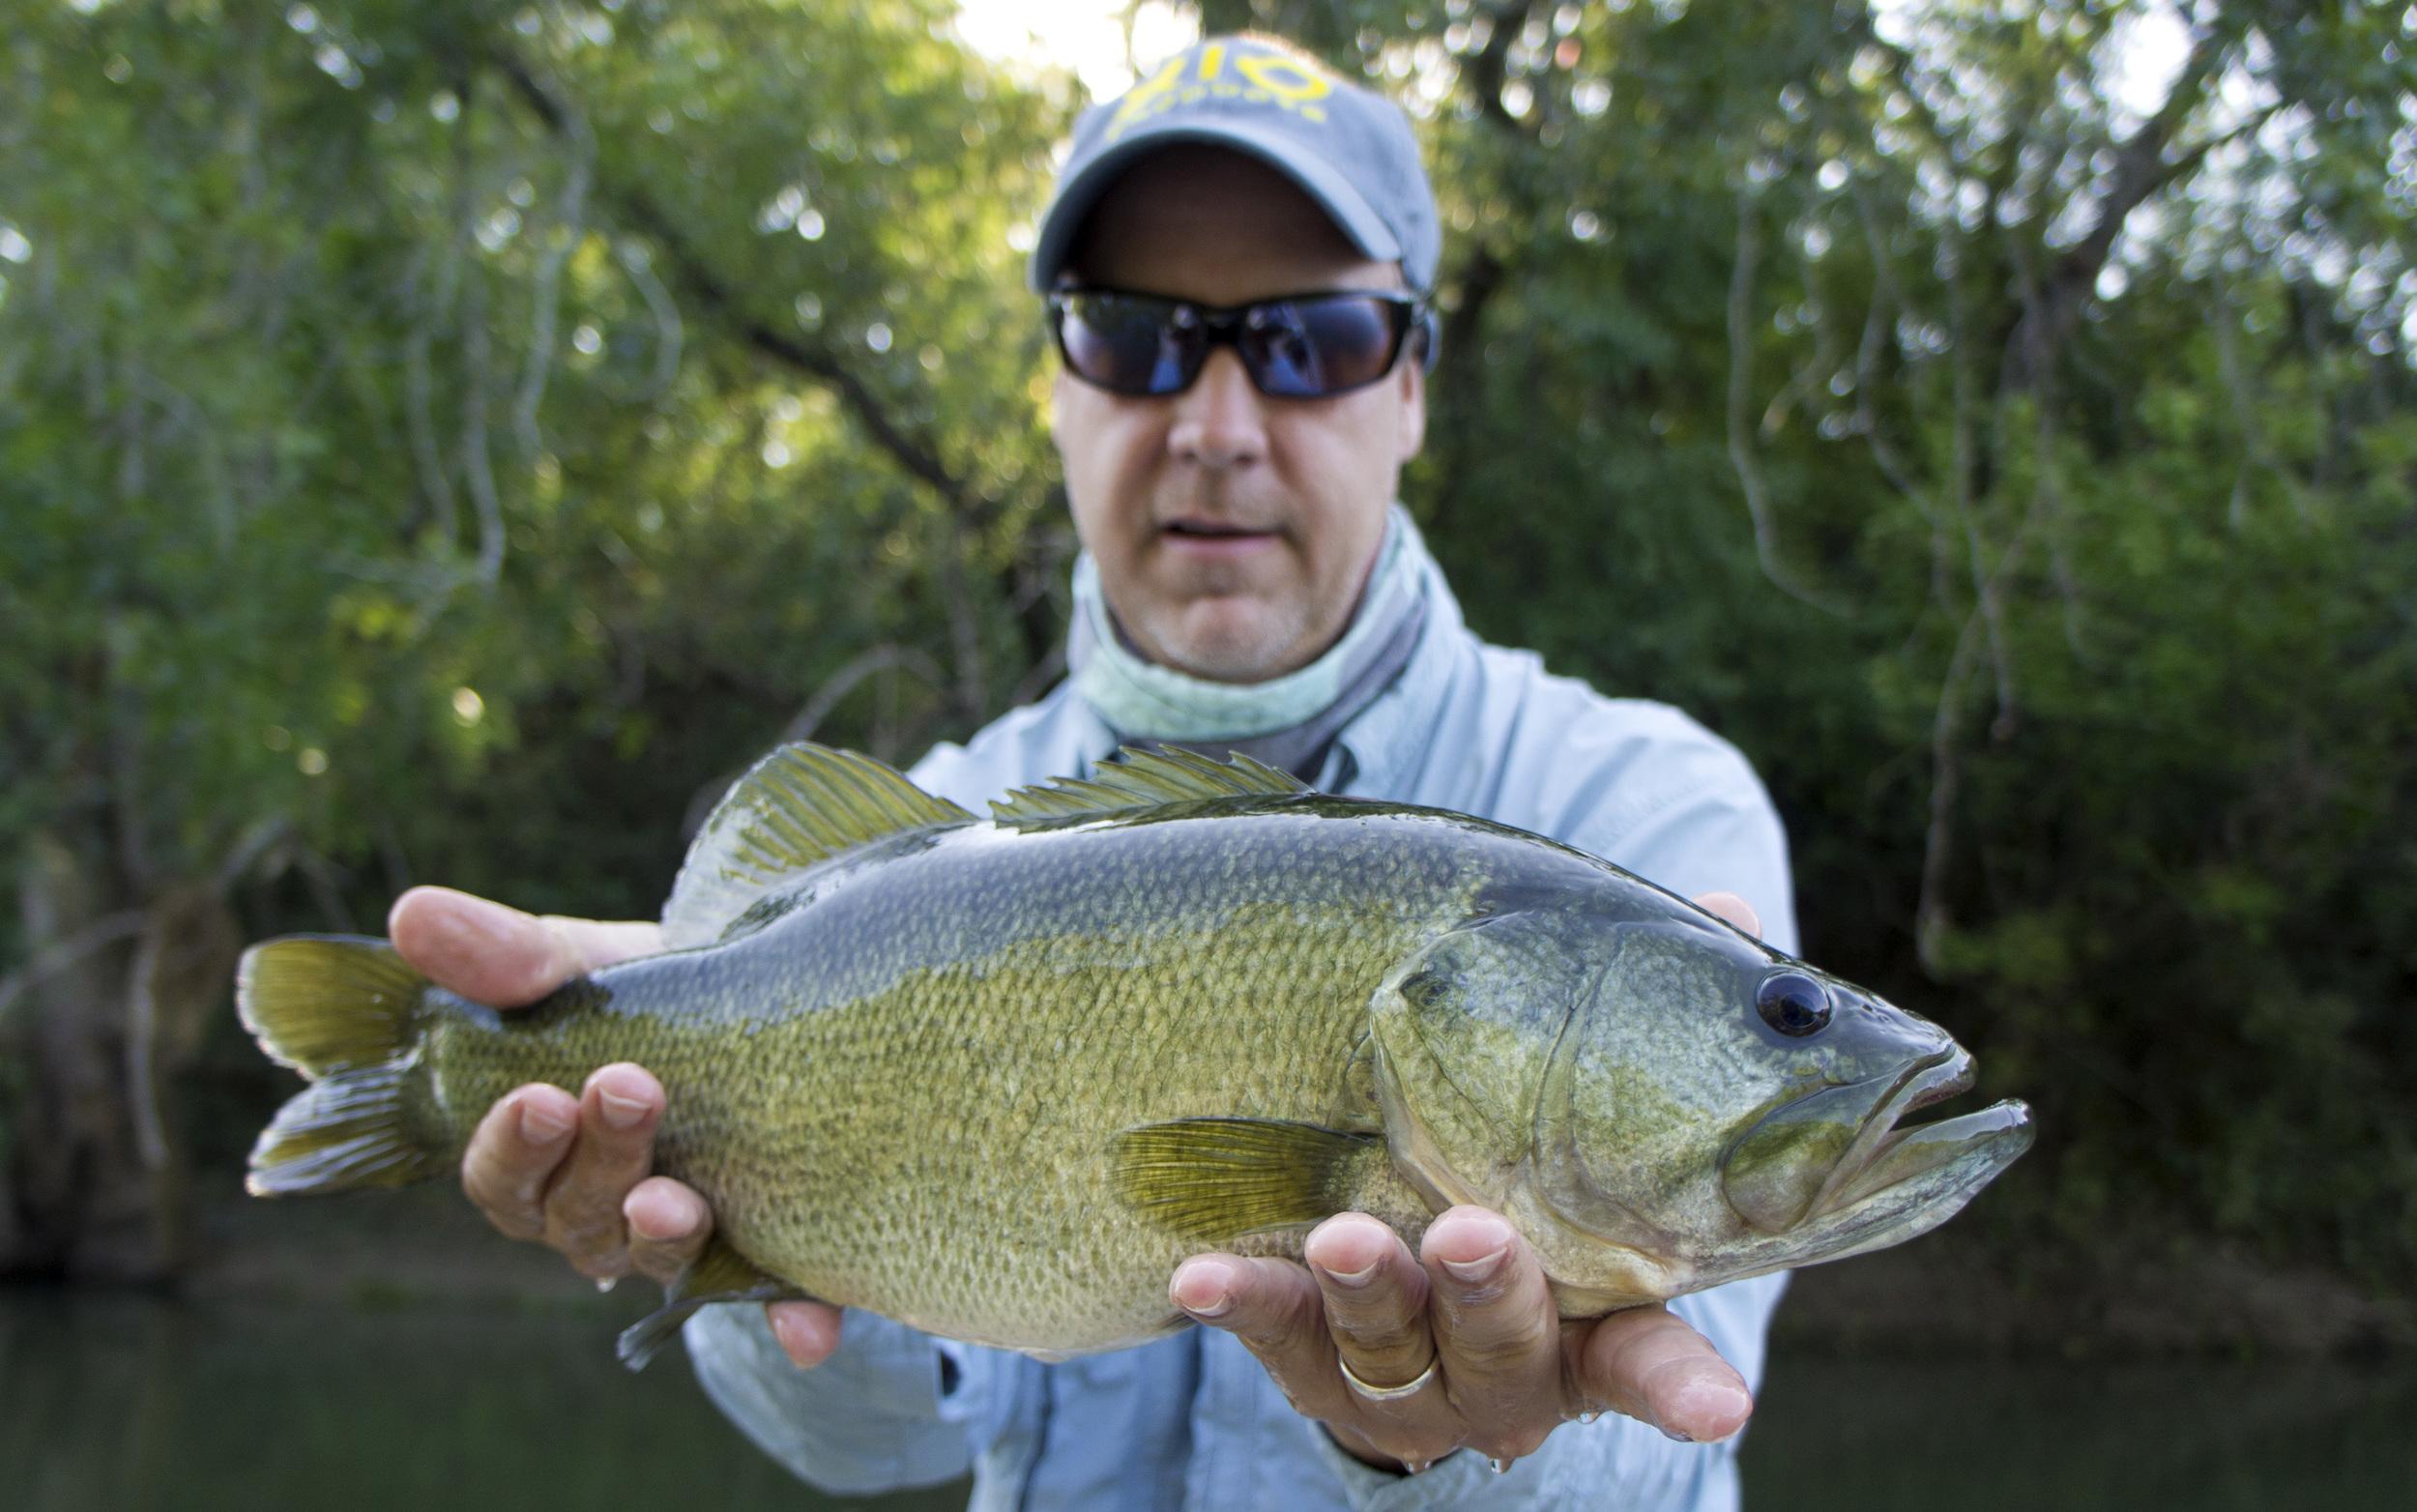 Jeff Davis with a huge Colorado River bass